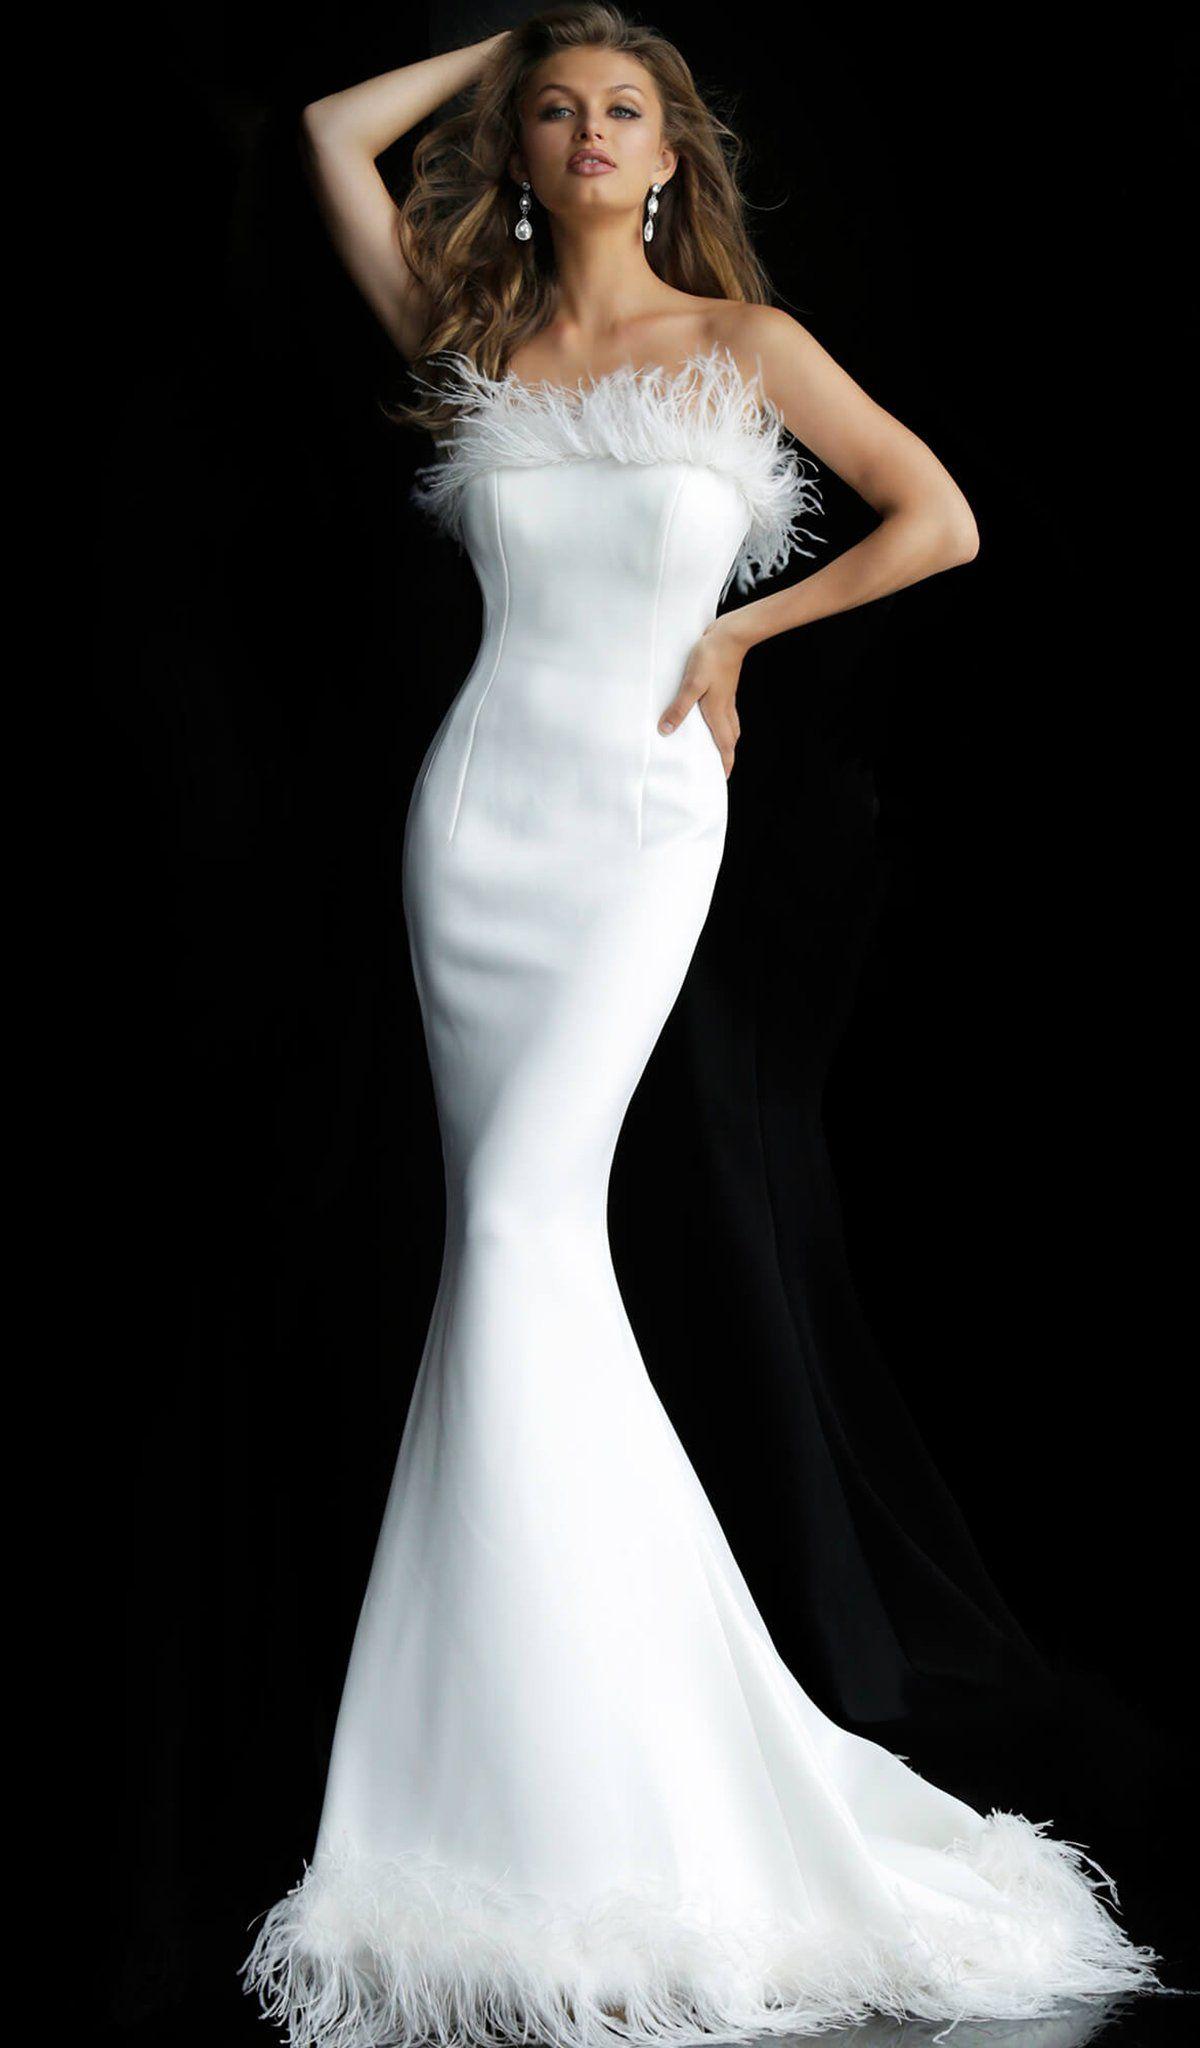 Jovani 63891 Strapless Feather Fringed Mermaid Gown In 2021 Strapless Wedding Dress Mermaid Informal Wedding Dresses Wedding Dress With Feathers [ 2048 x 1200 Pixel ]